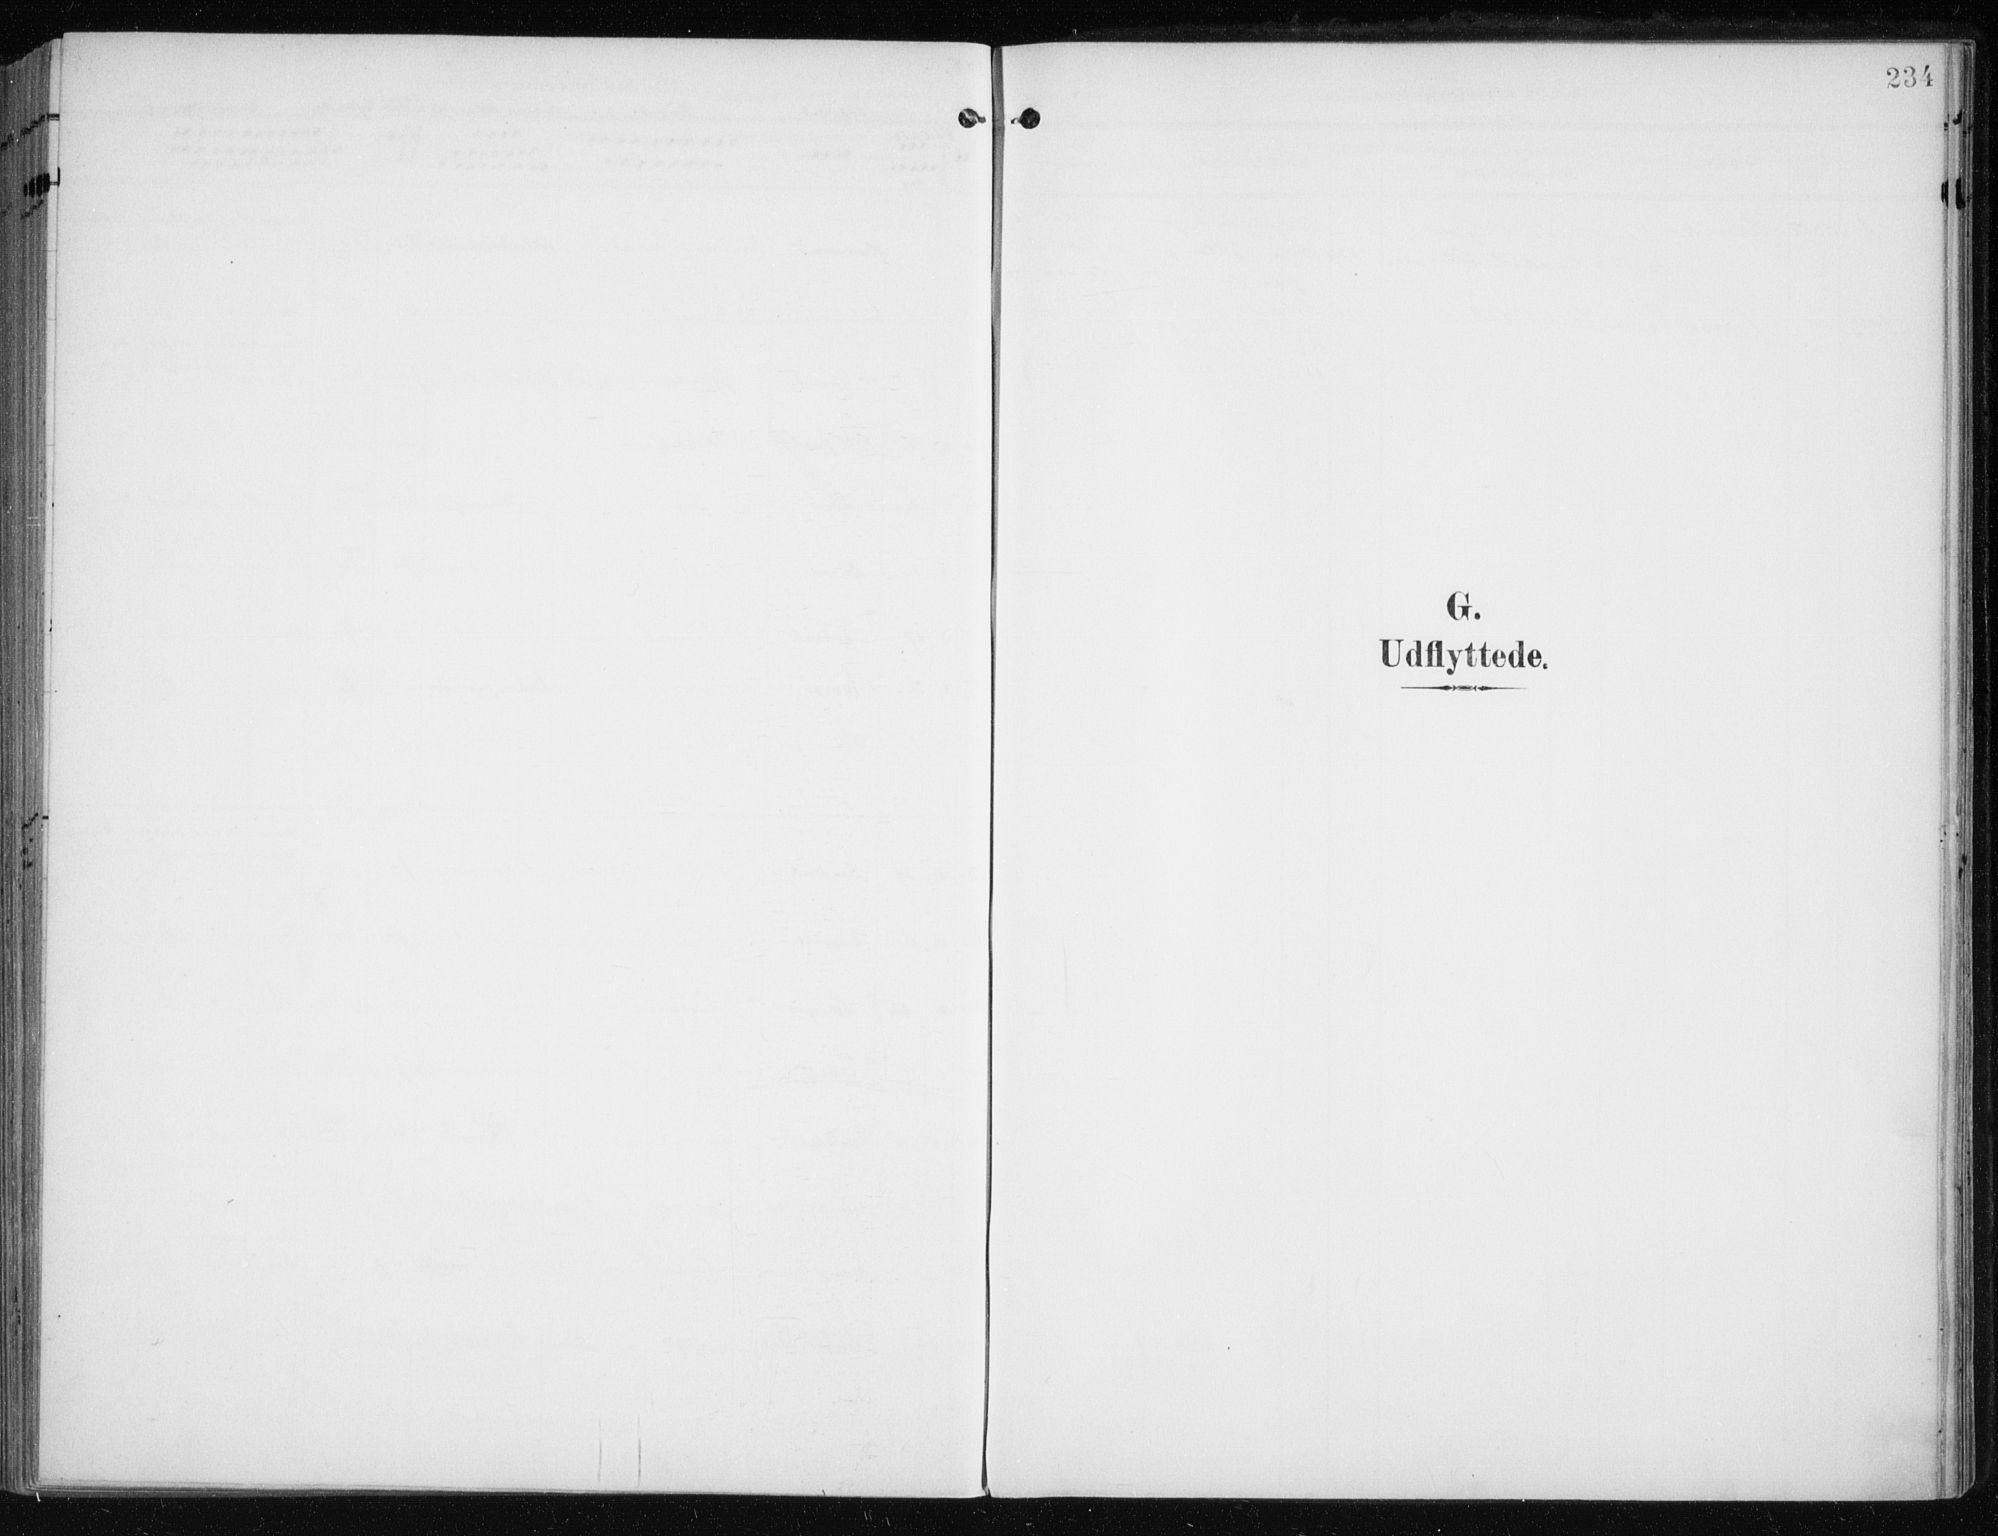 SATØ, Måsøy sokneprestkontor, H/Ha/L0009kirke: Ministerialbok nr. 9, 1903-1914, s. 234